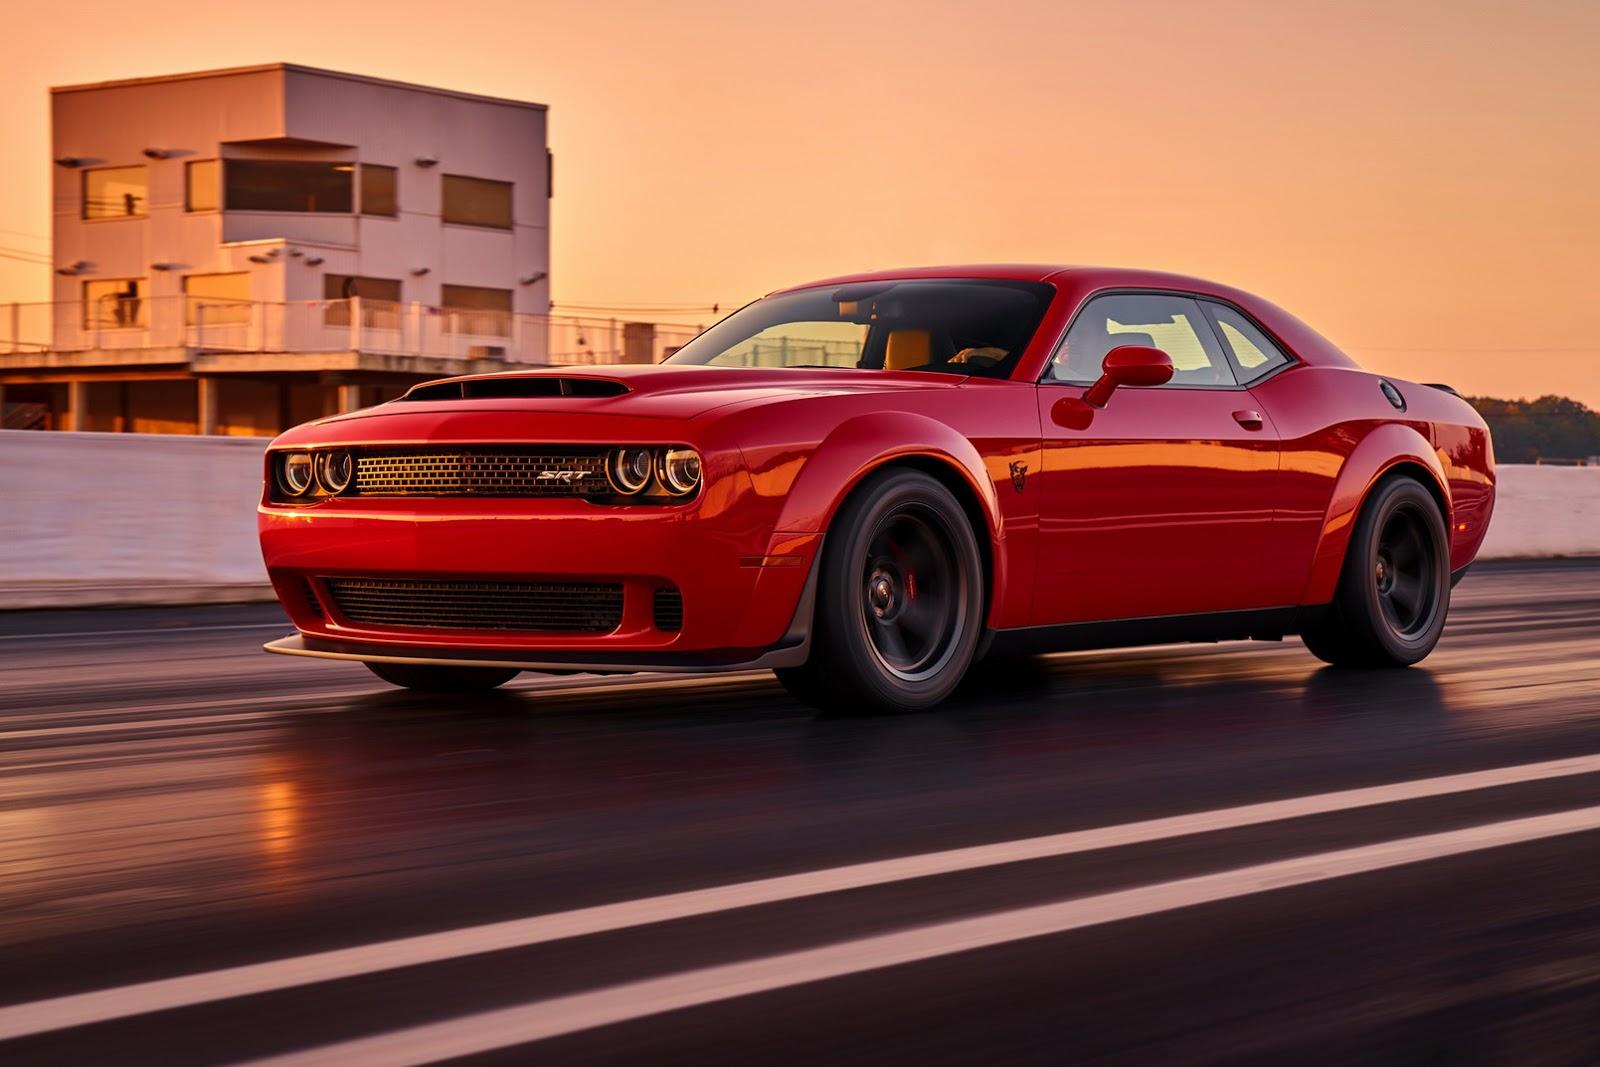 2018 Dodge Challenger Demon Hits eBay With Stupid $250k Price ...